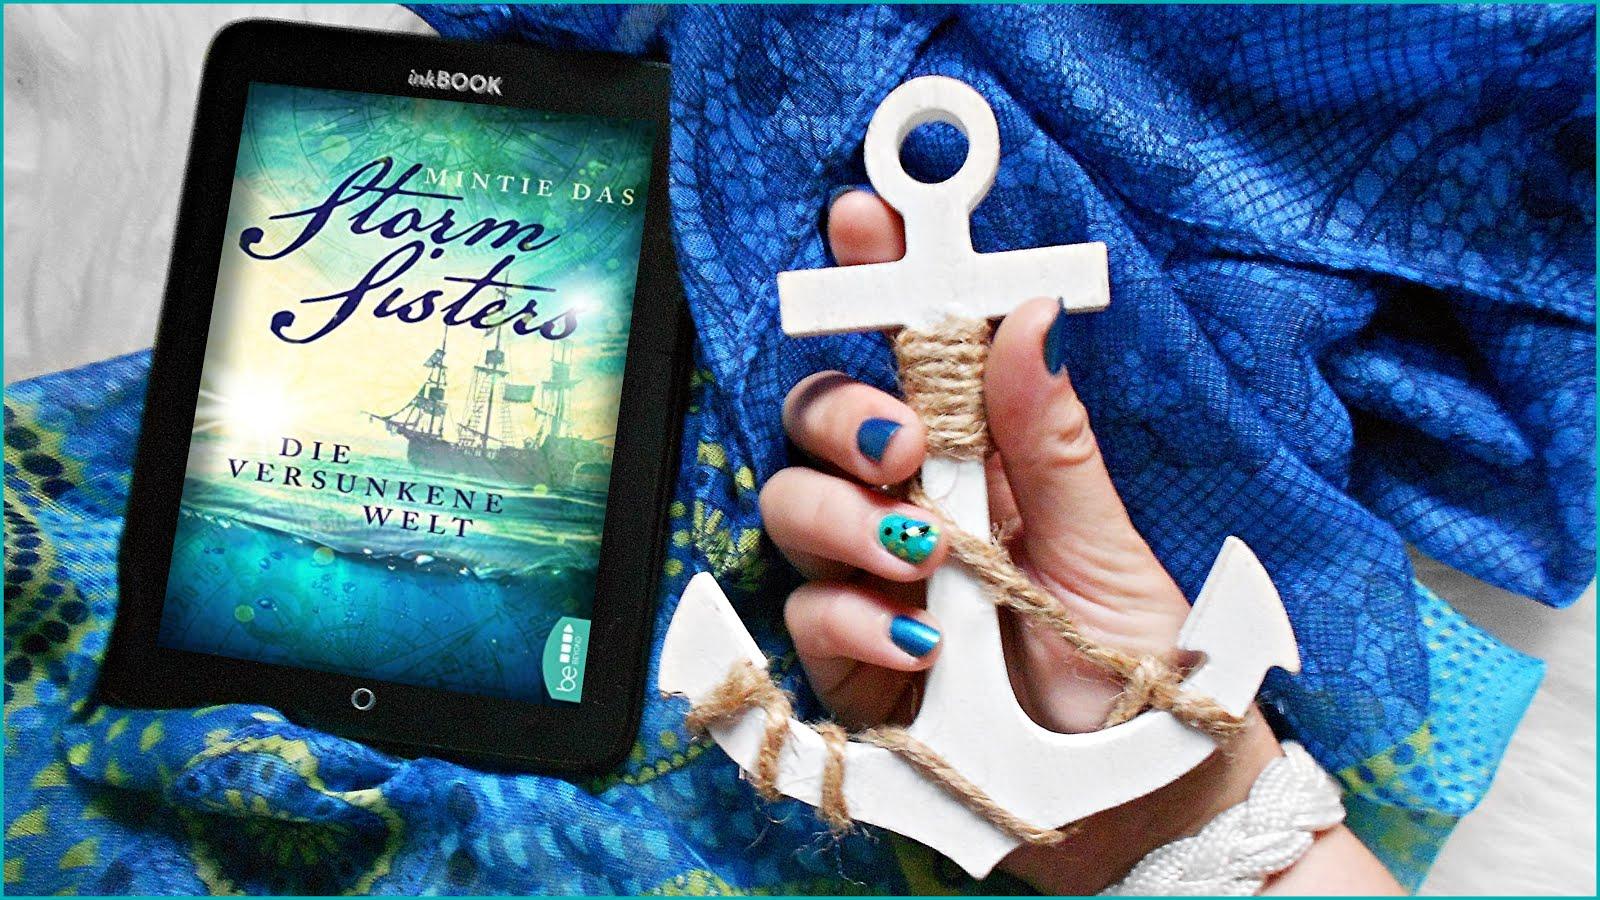 Zitate Storm Sisters Die versunkene Welt Mintie Das beeBooks Piraten Piratinnen Piretten Ozean Meer Indien